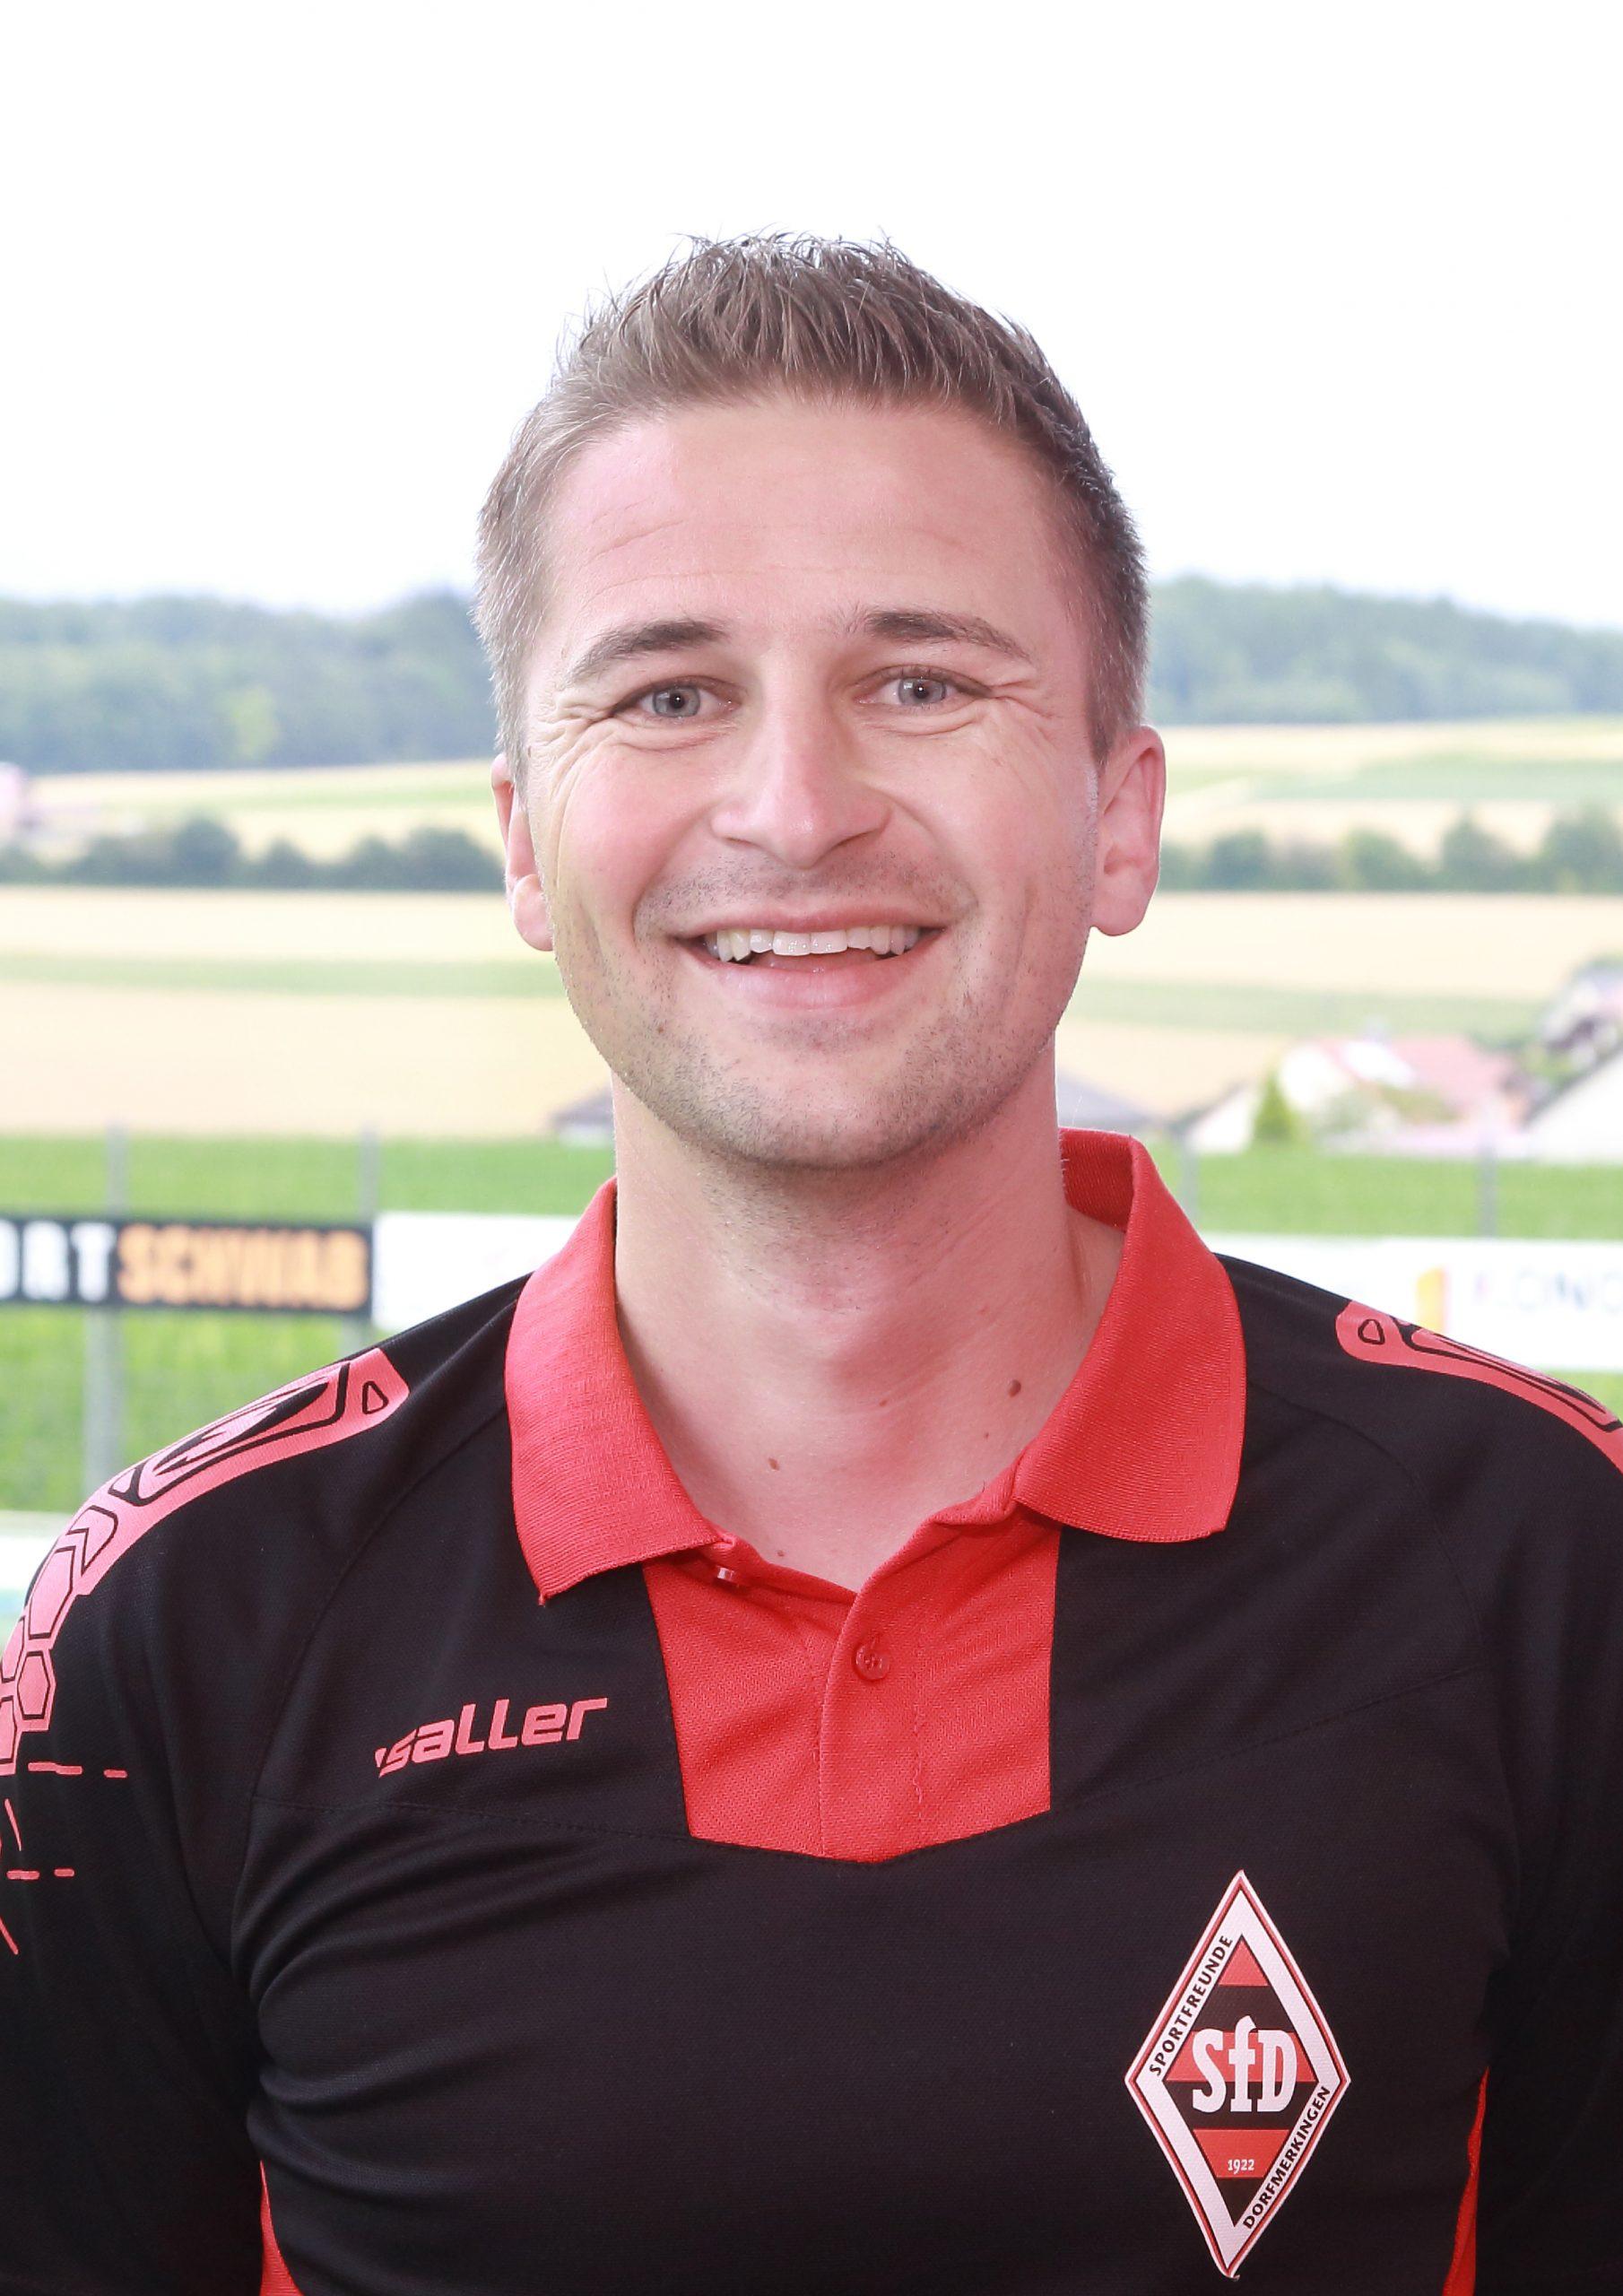 Stefan Schill